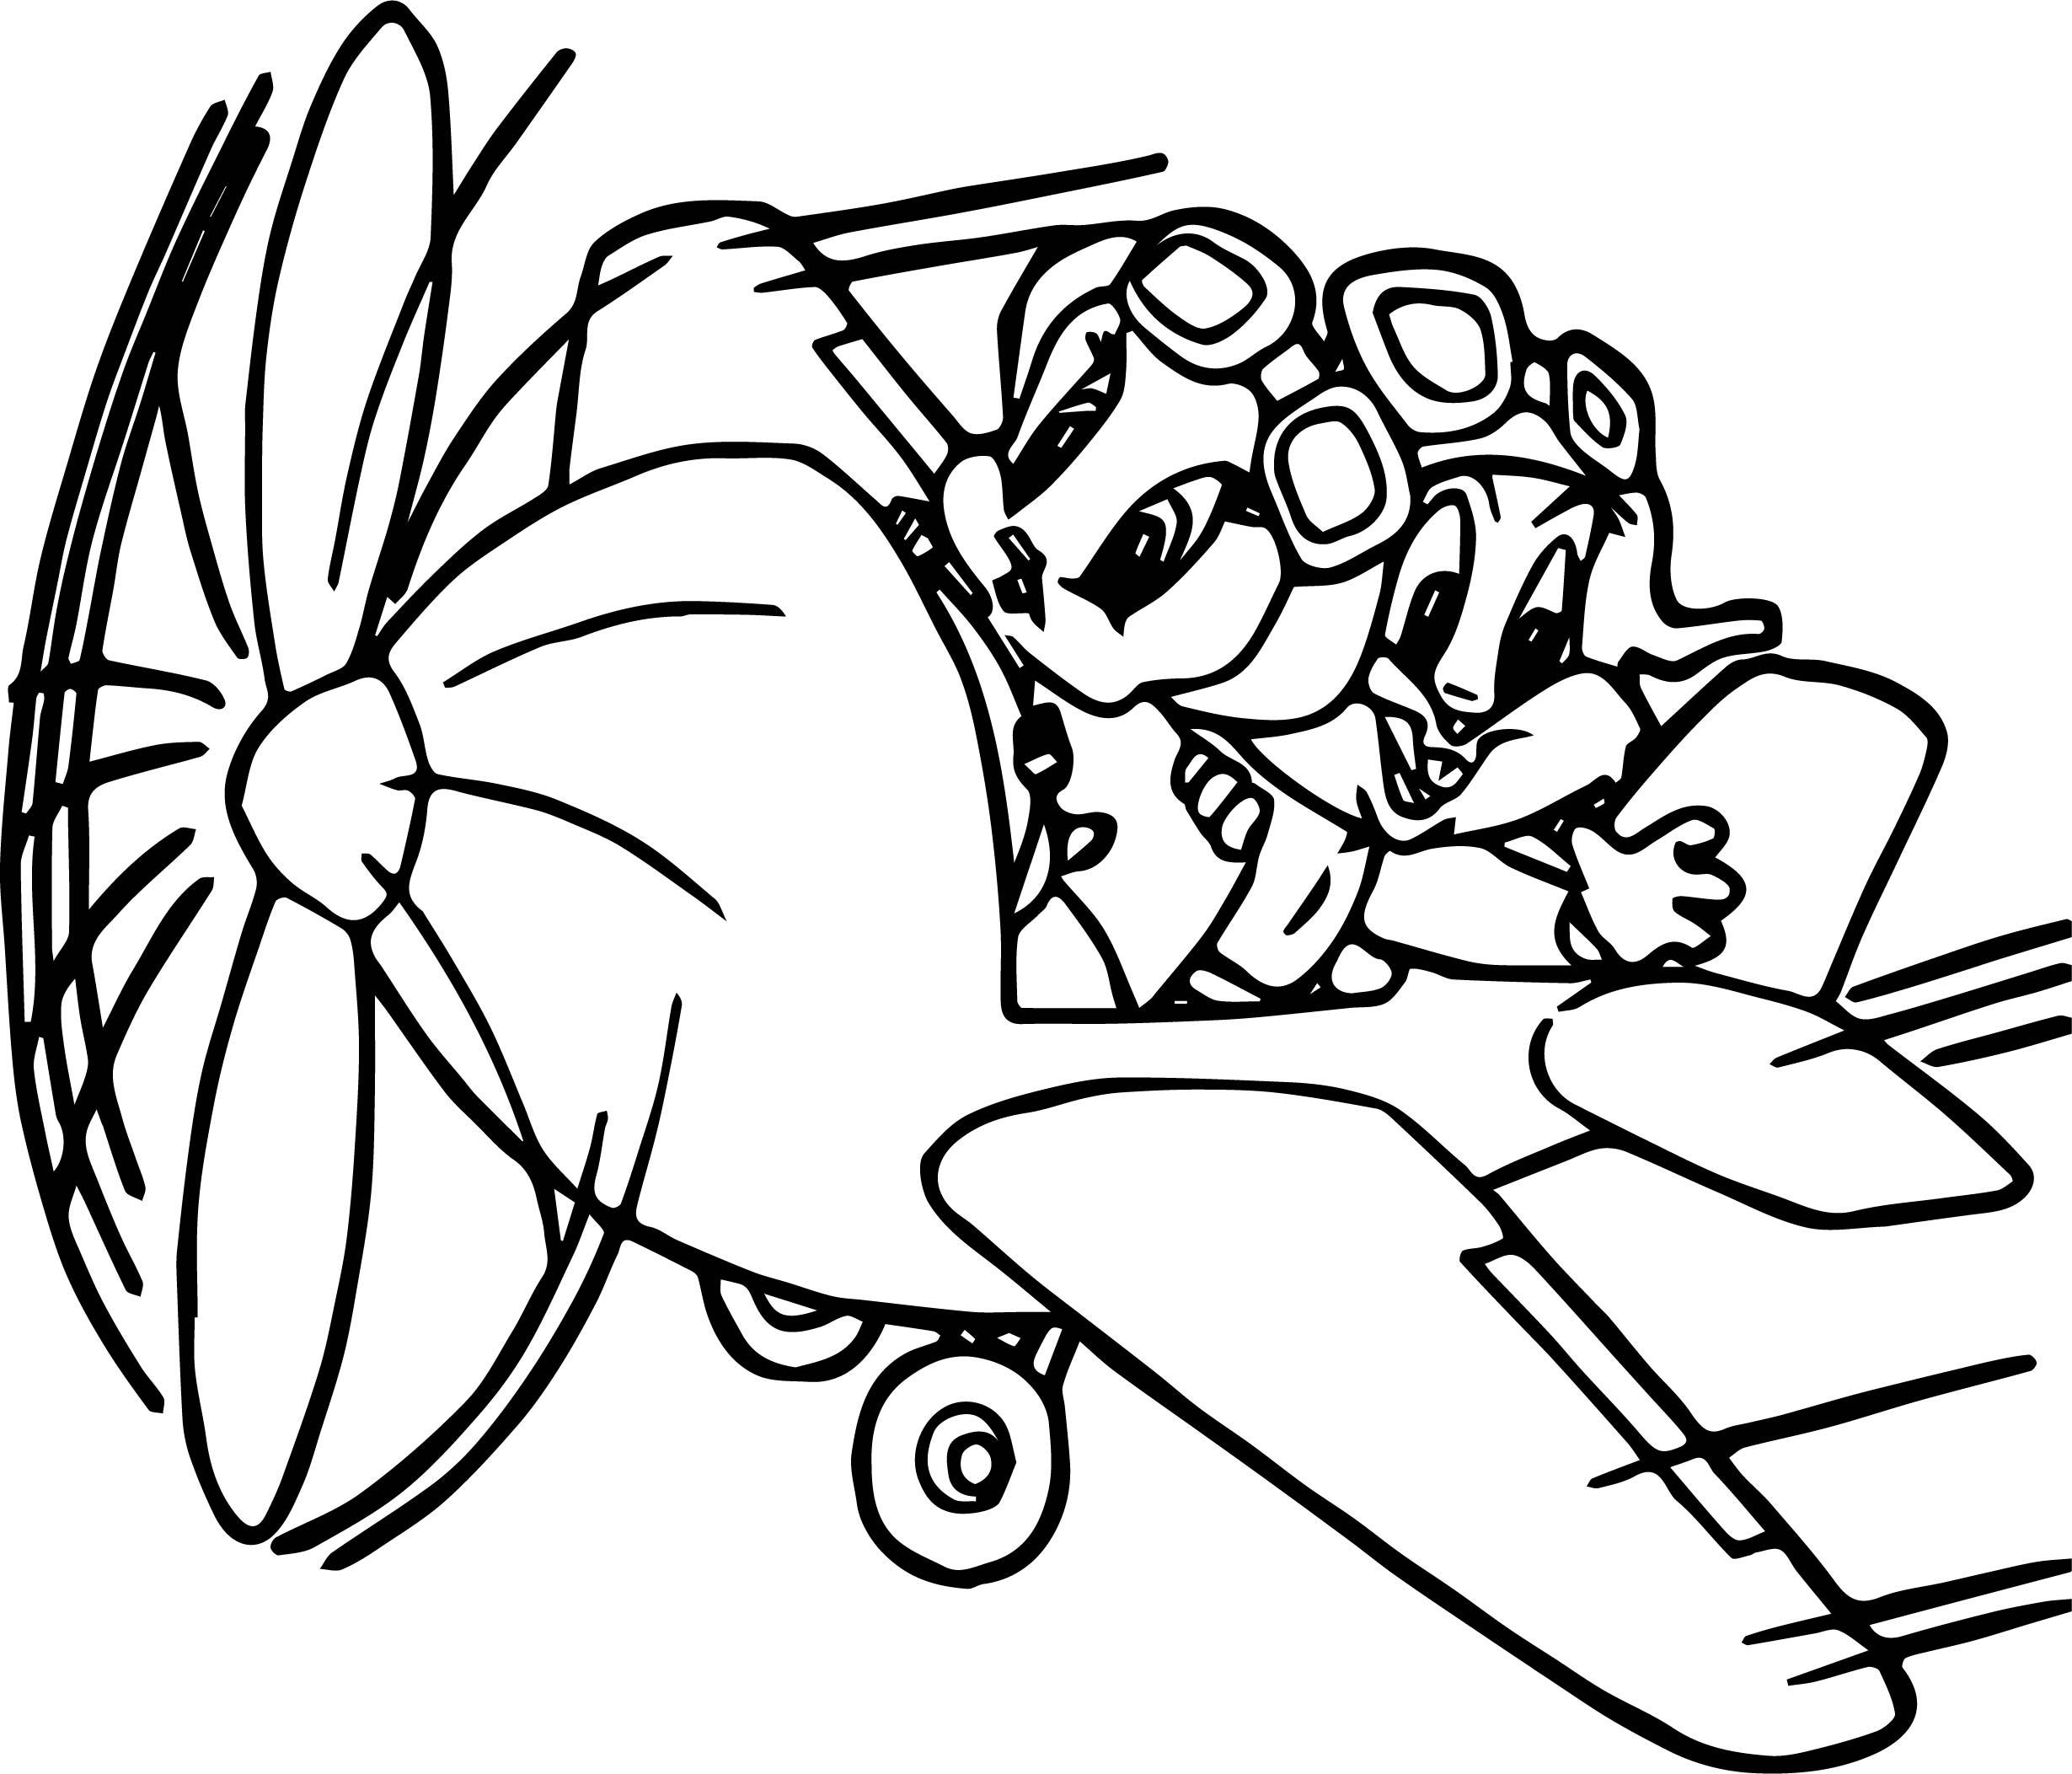 2459x2105 Warner Bros Baby Looney Tunes Bugs Bunny Tweety Plane Coloring